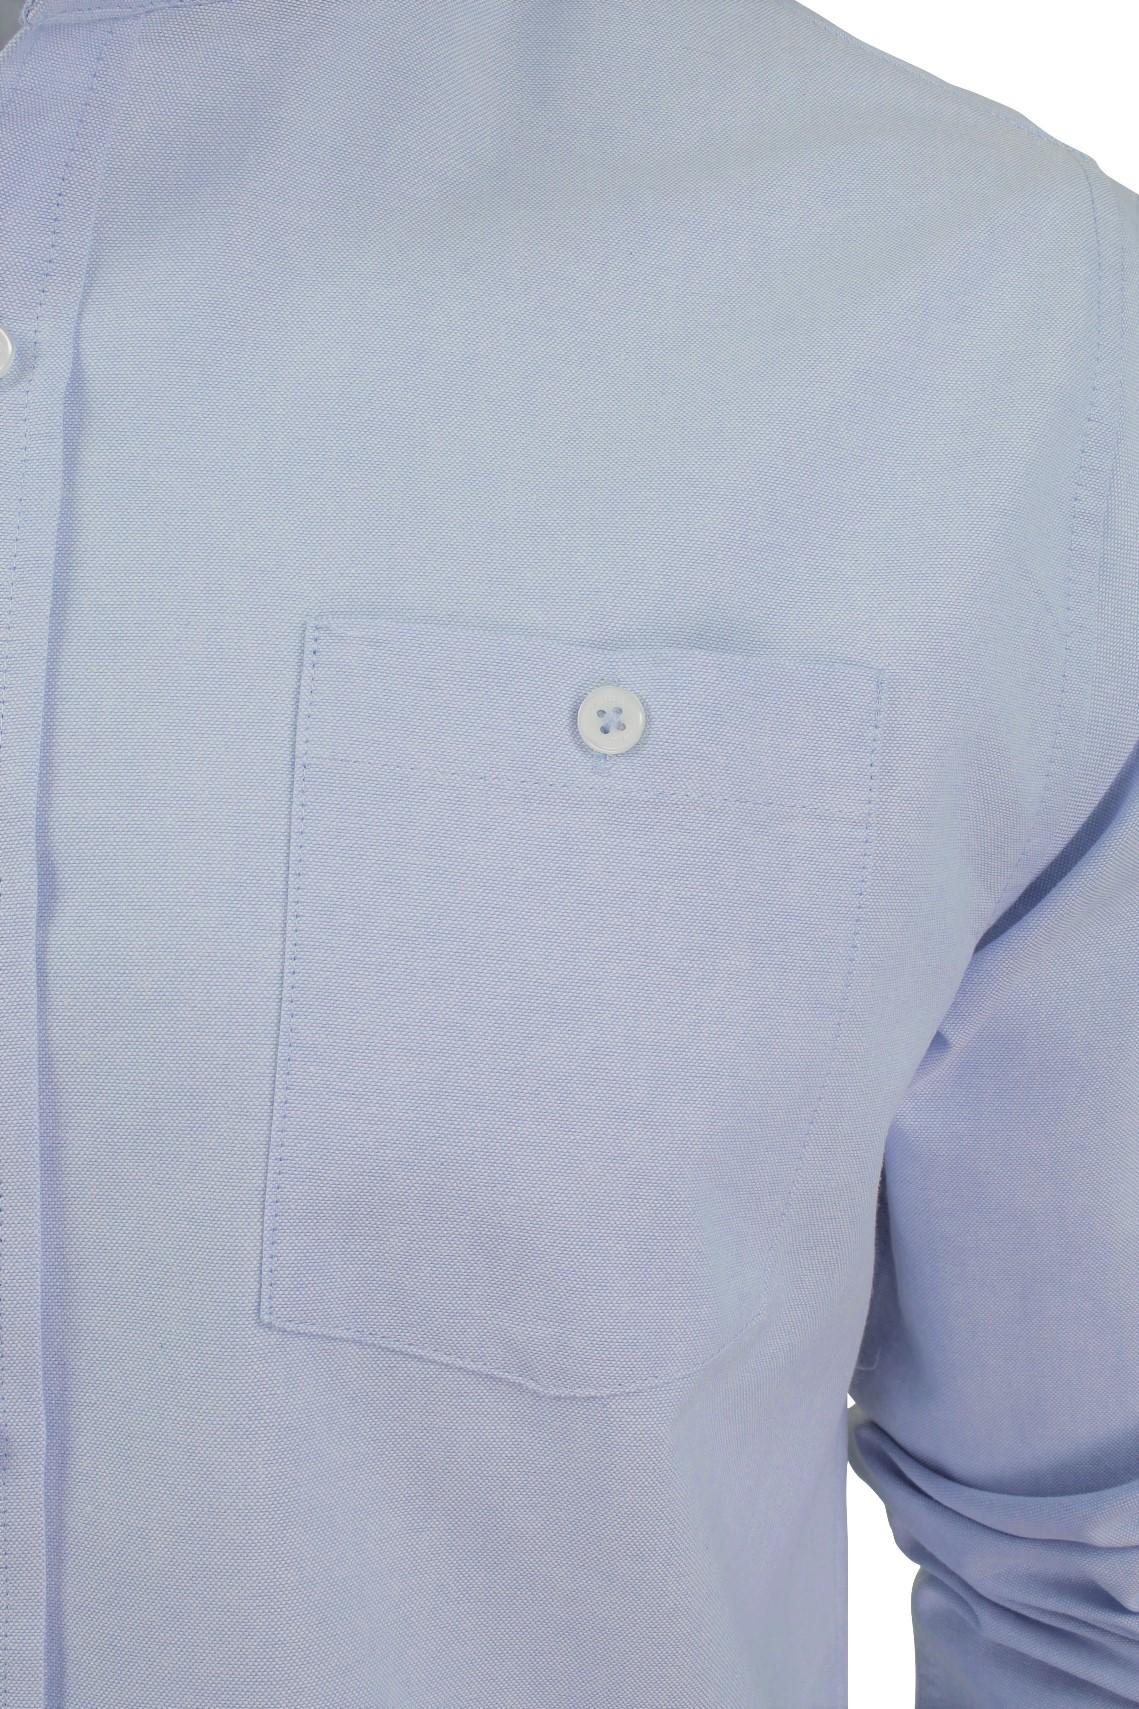 Xact-Mens-Grandad-Collar-Nehru-Oxford-de-Superdry-de-manga-larga-039-Augusto-039-s miniatura 4